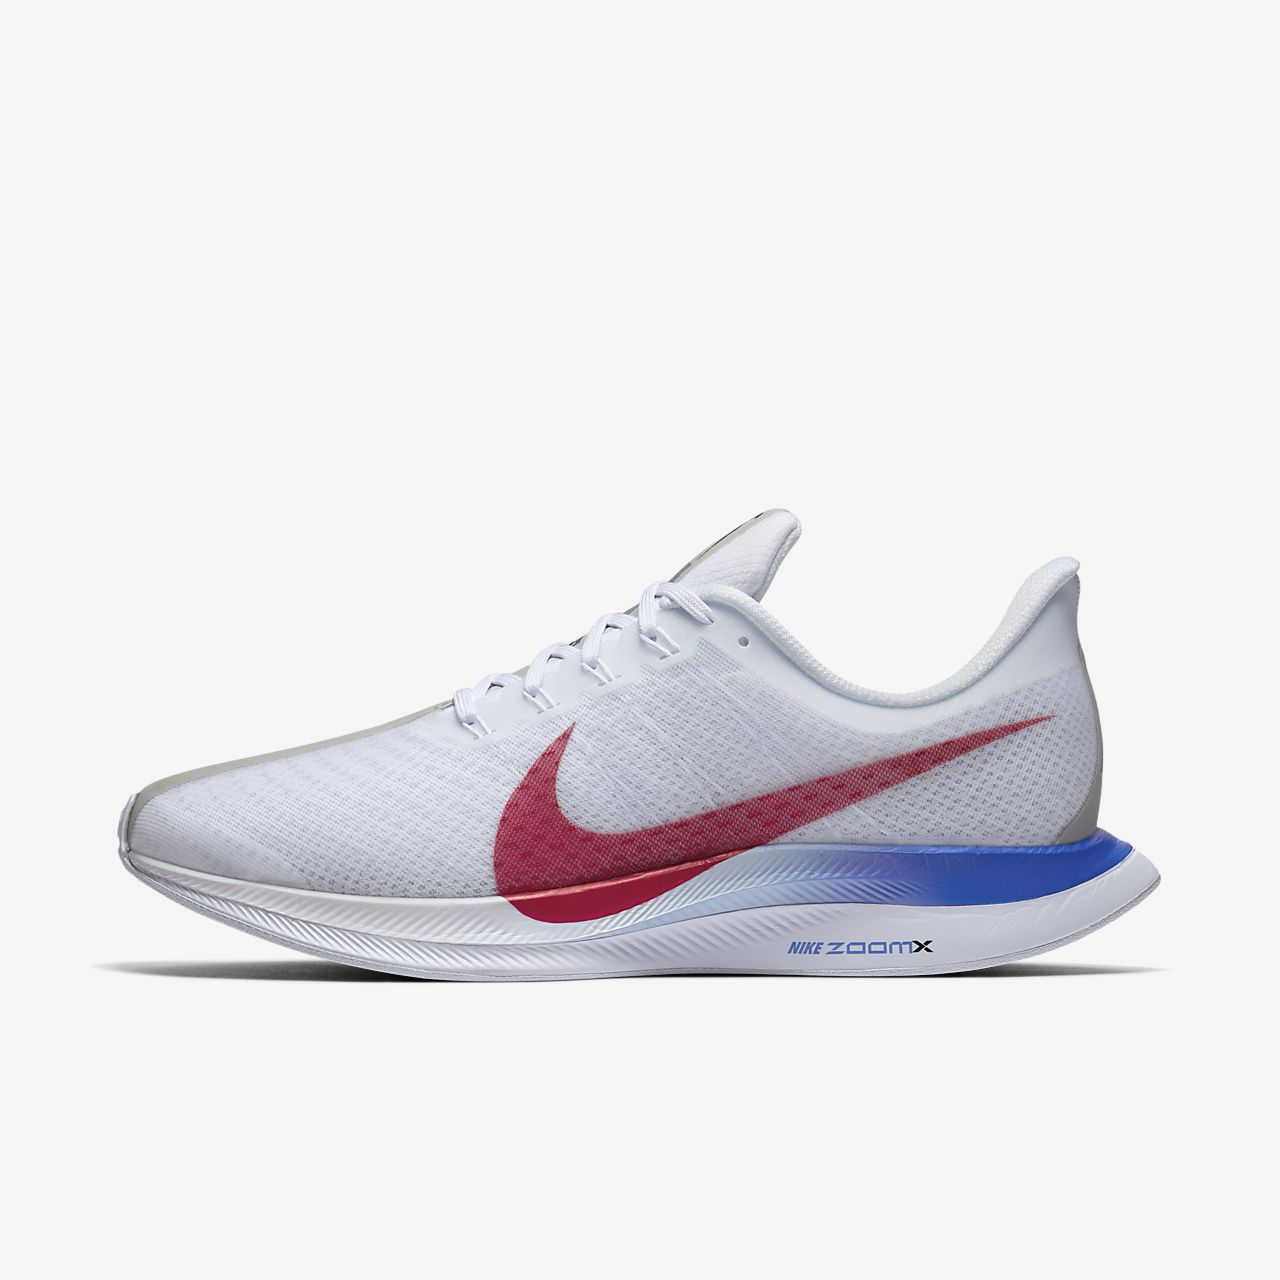 Nike Zoom Pegasus 35 Turbo BRS Herren-Laufschuh